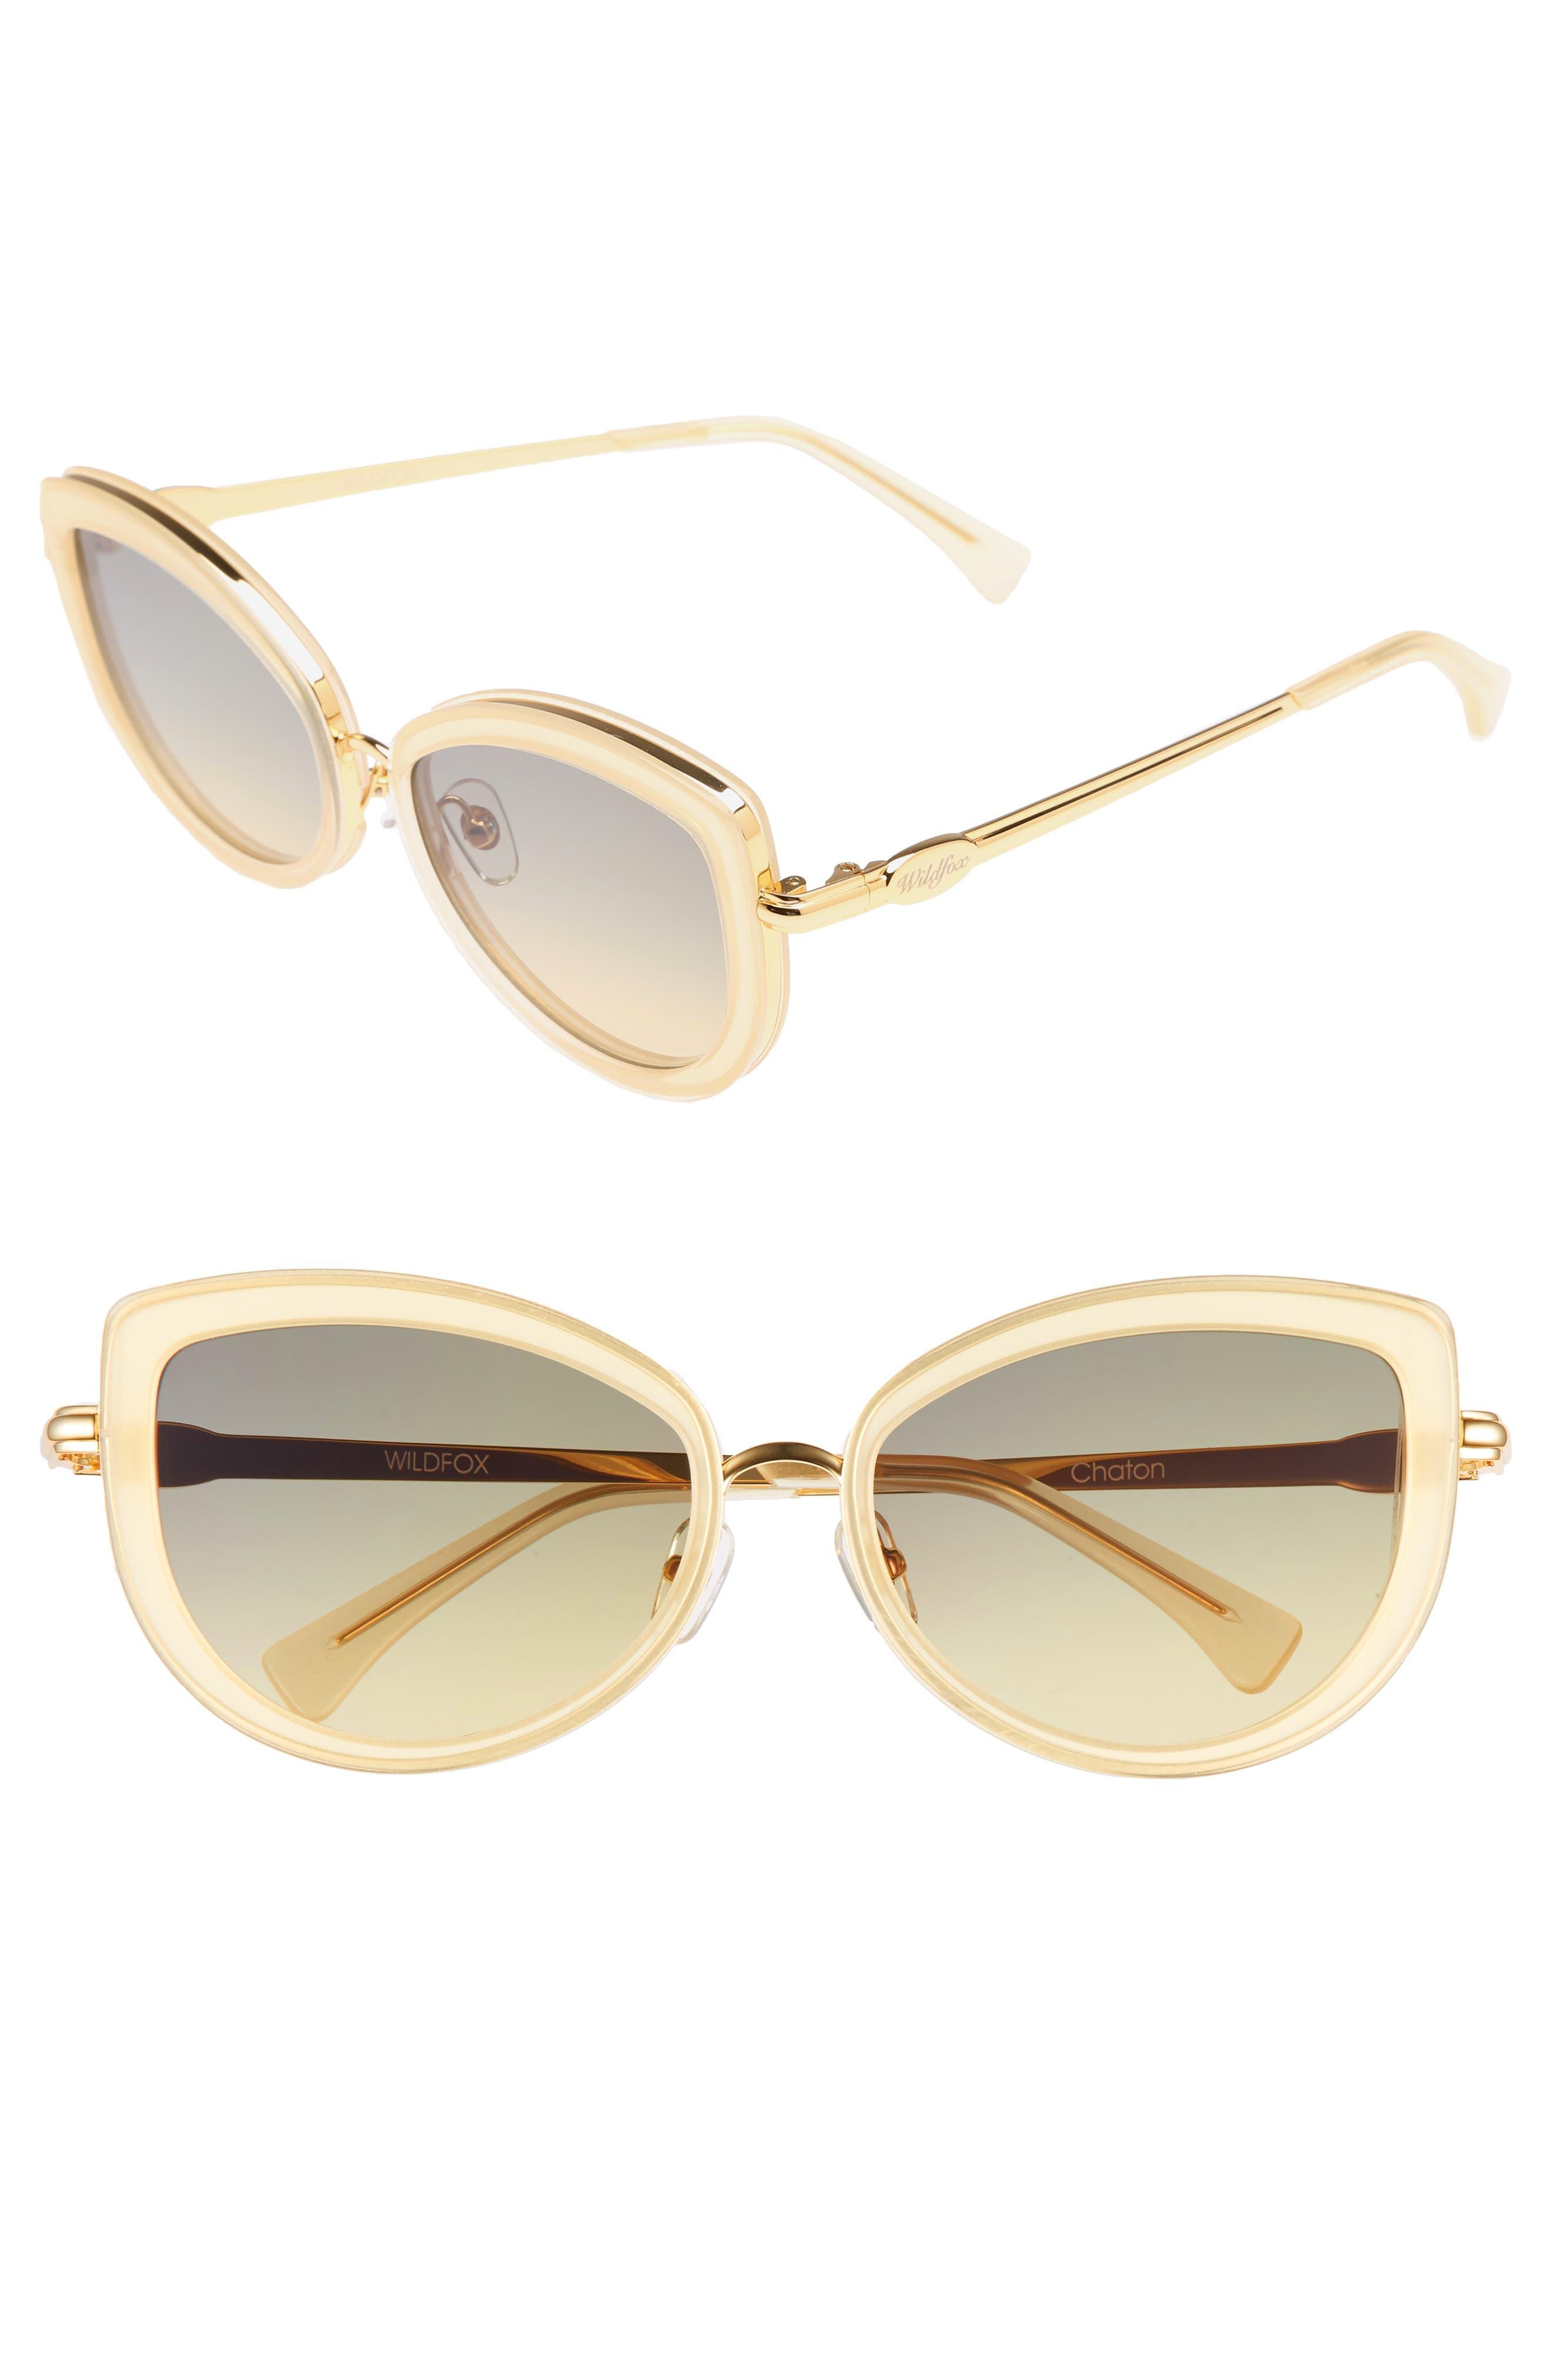 Chaton 54mm Sunglasses,                         Main,                         color, Gold